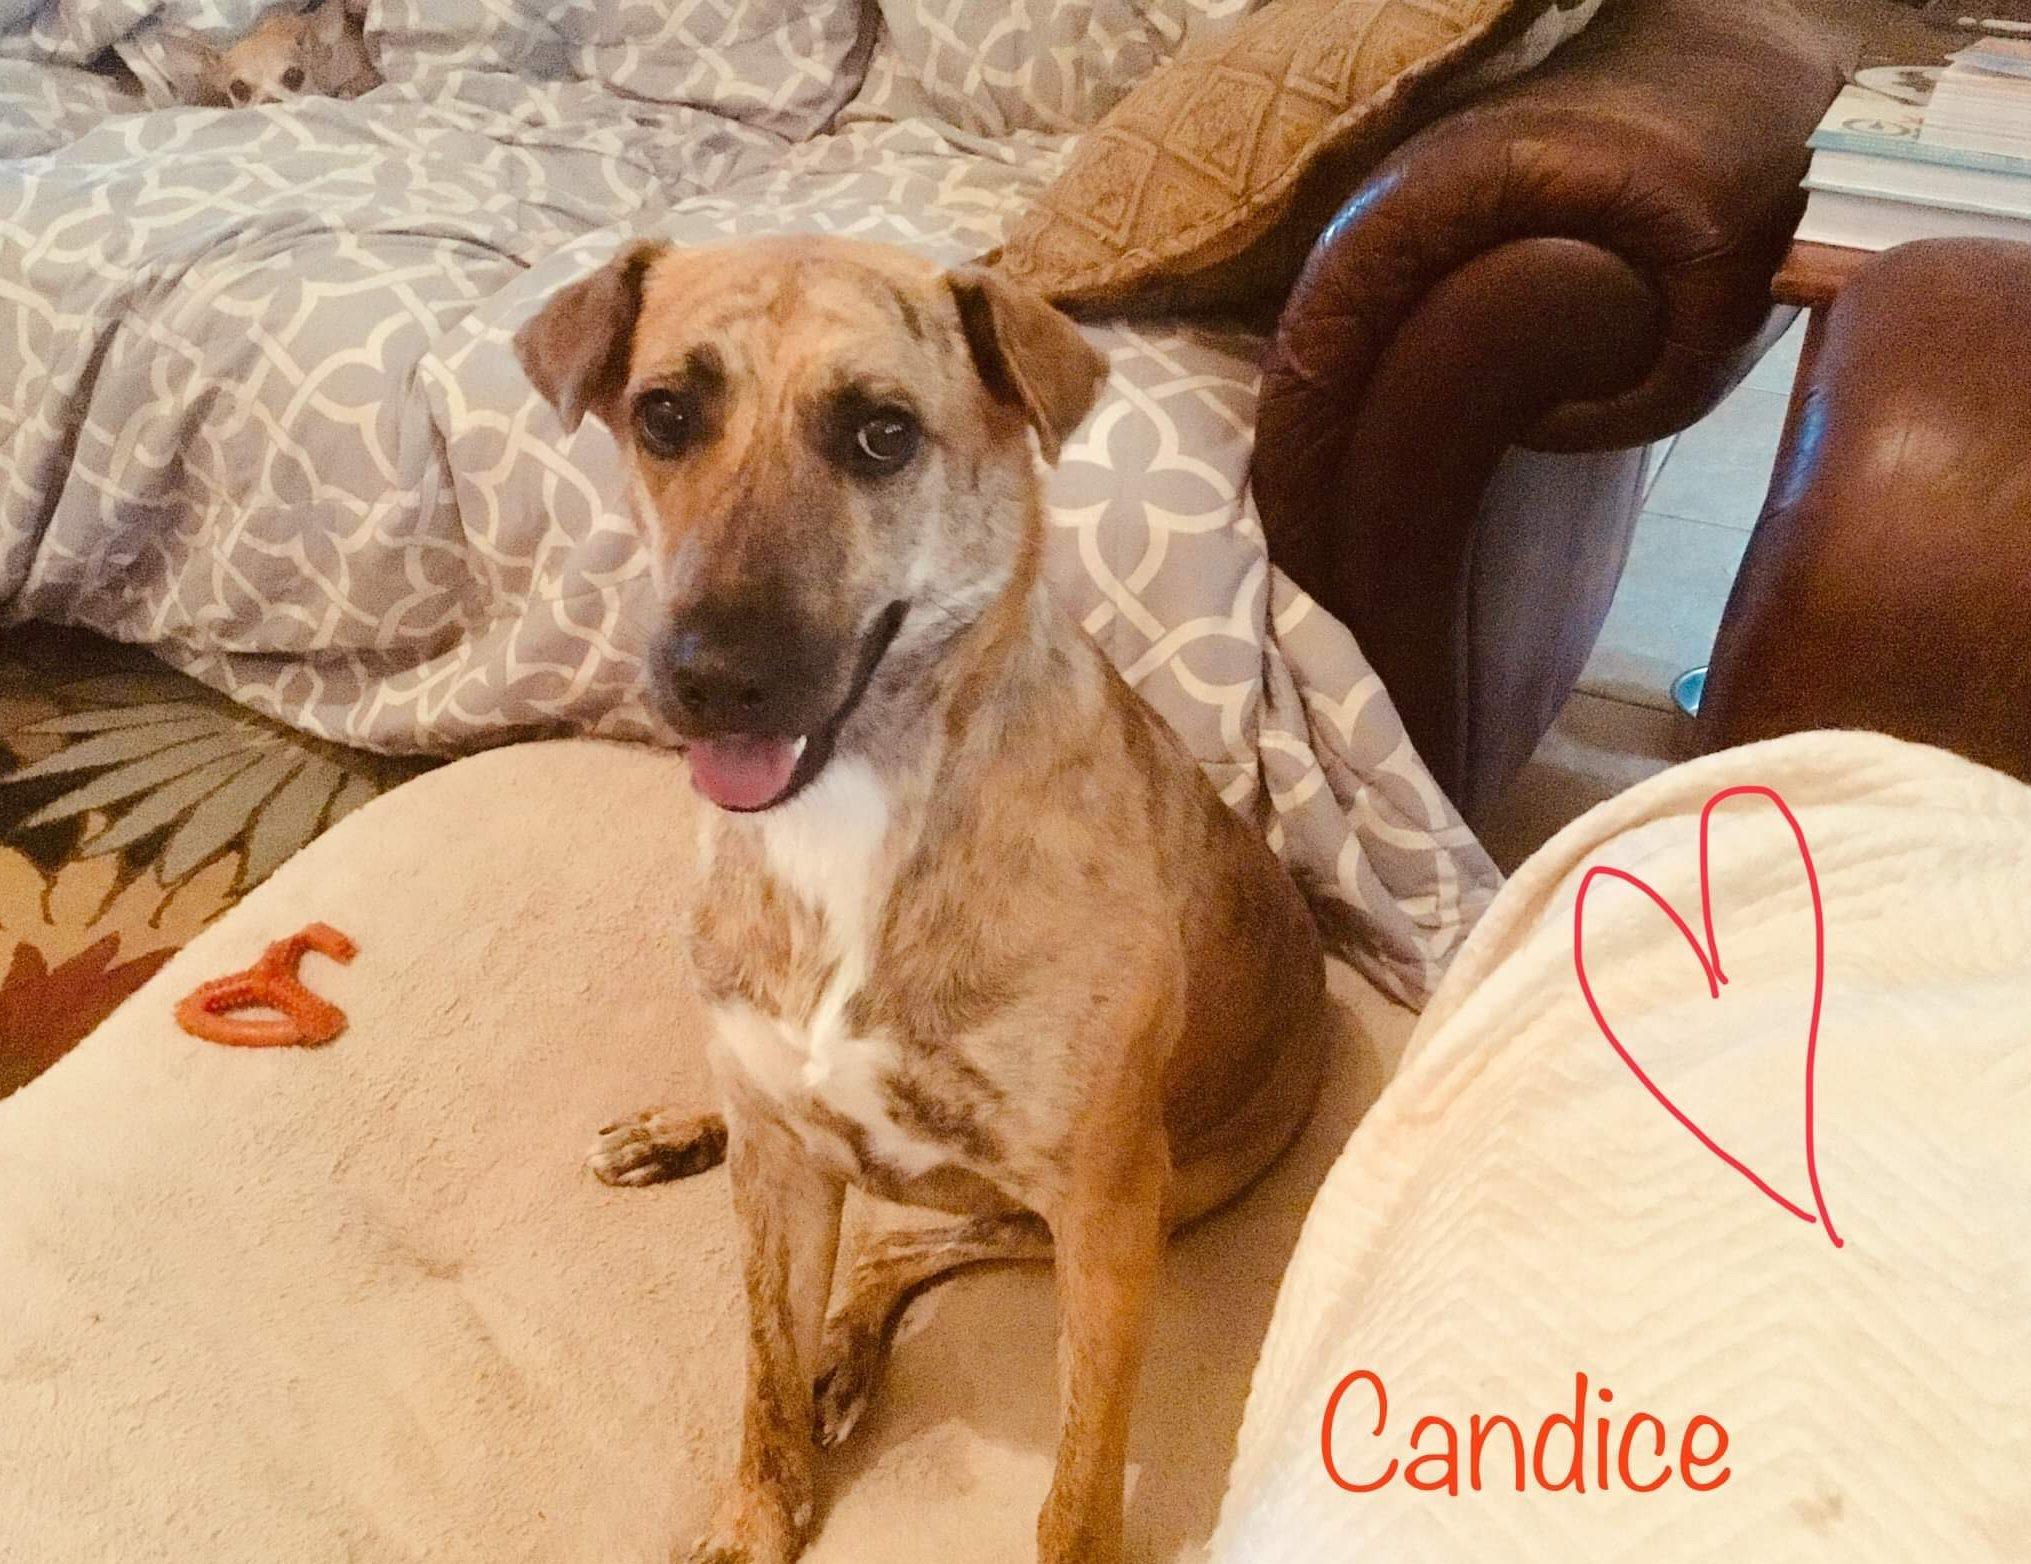 <UL> Candice <LI> Breed: Lab/Greyhound mix <LI> Sex: Female <LI> Age: 3 yrs old <LI> Fee: $2